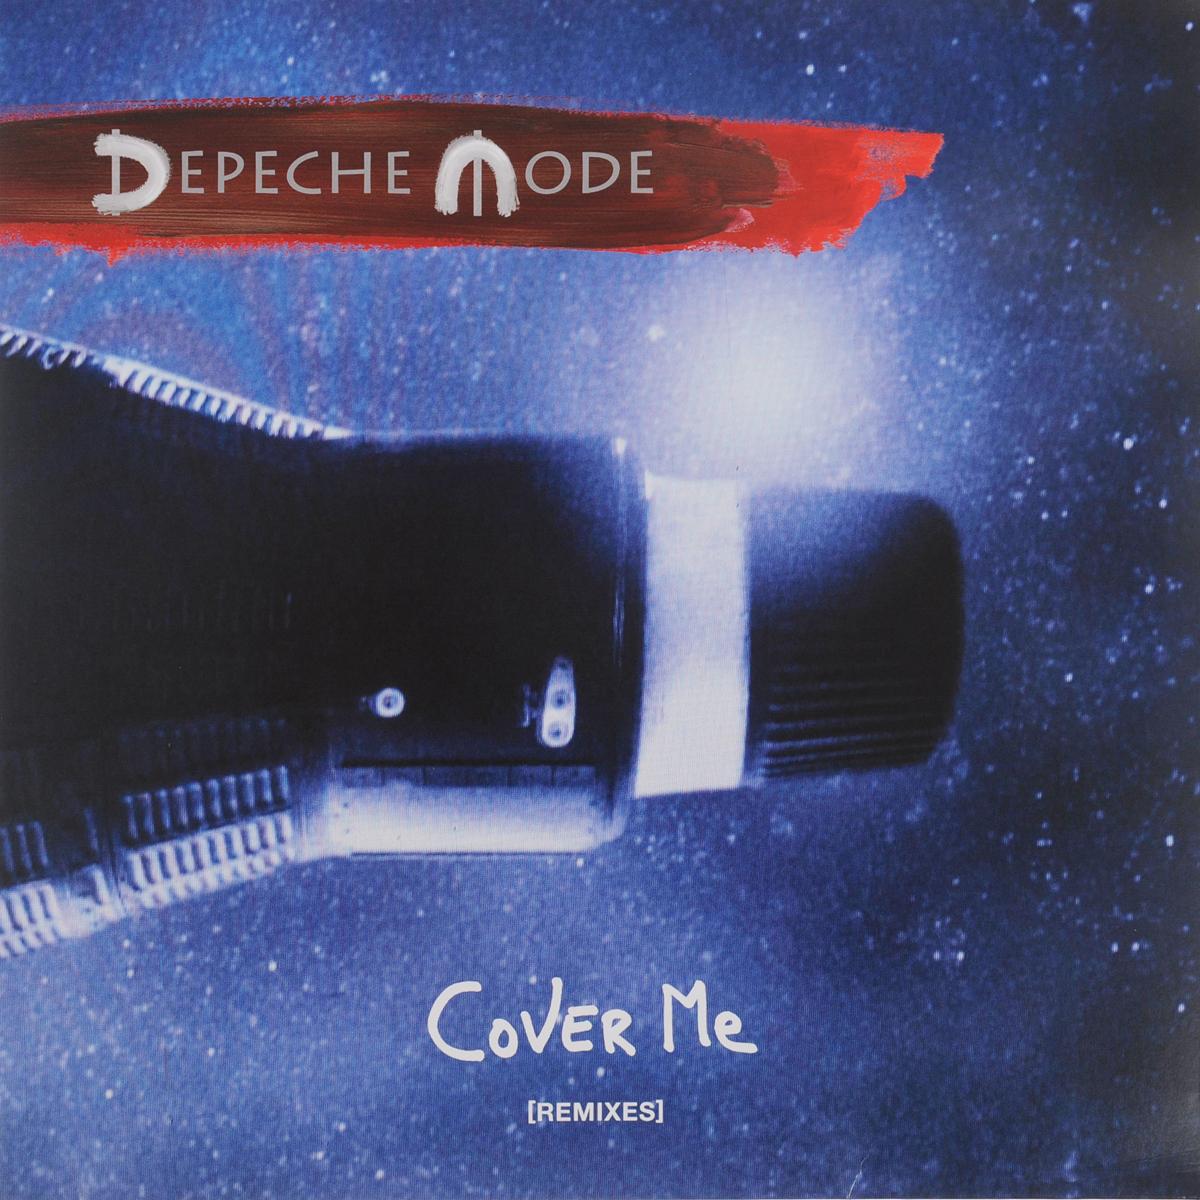 Depeche Mode Depeche Mode. Cover Me (Remixes) (2 LP) depeche mode depeche mode cover me remixes 2 lp 180 gr